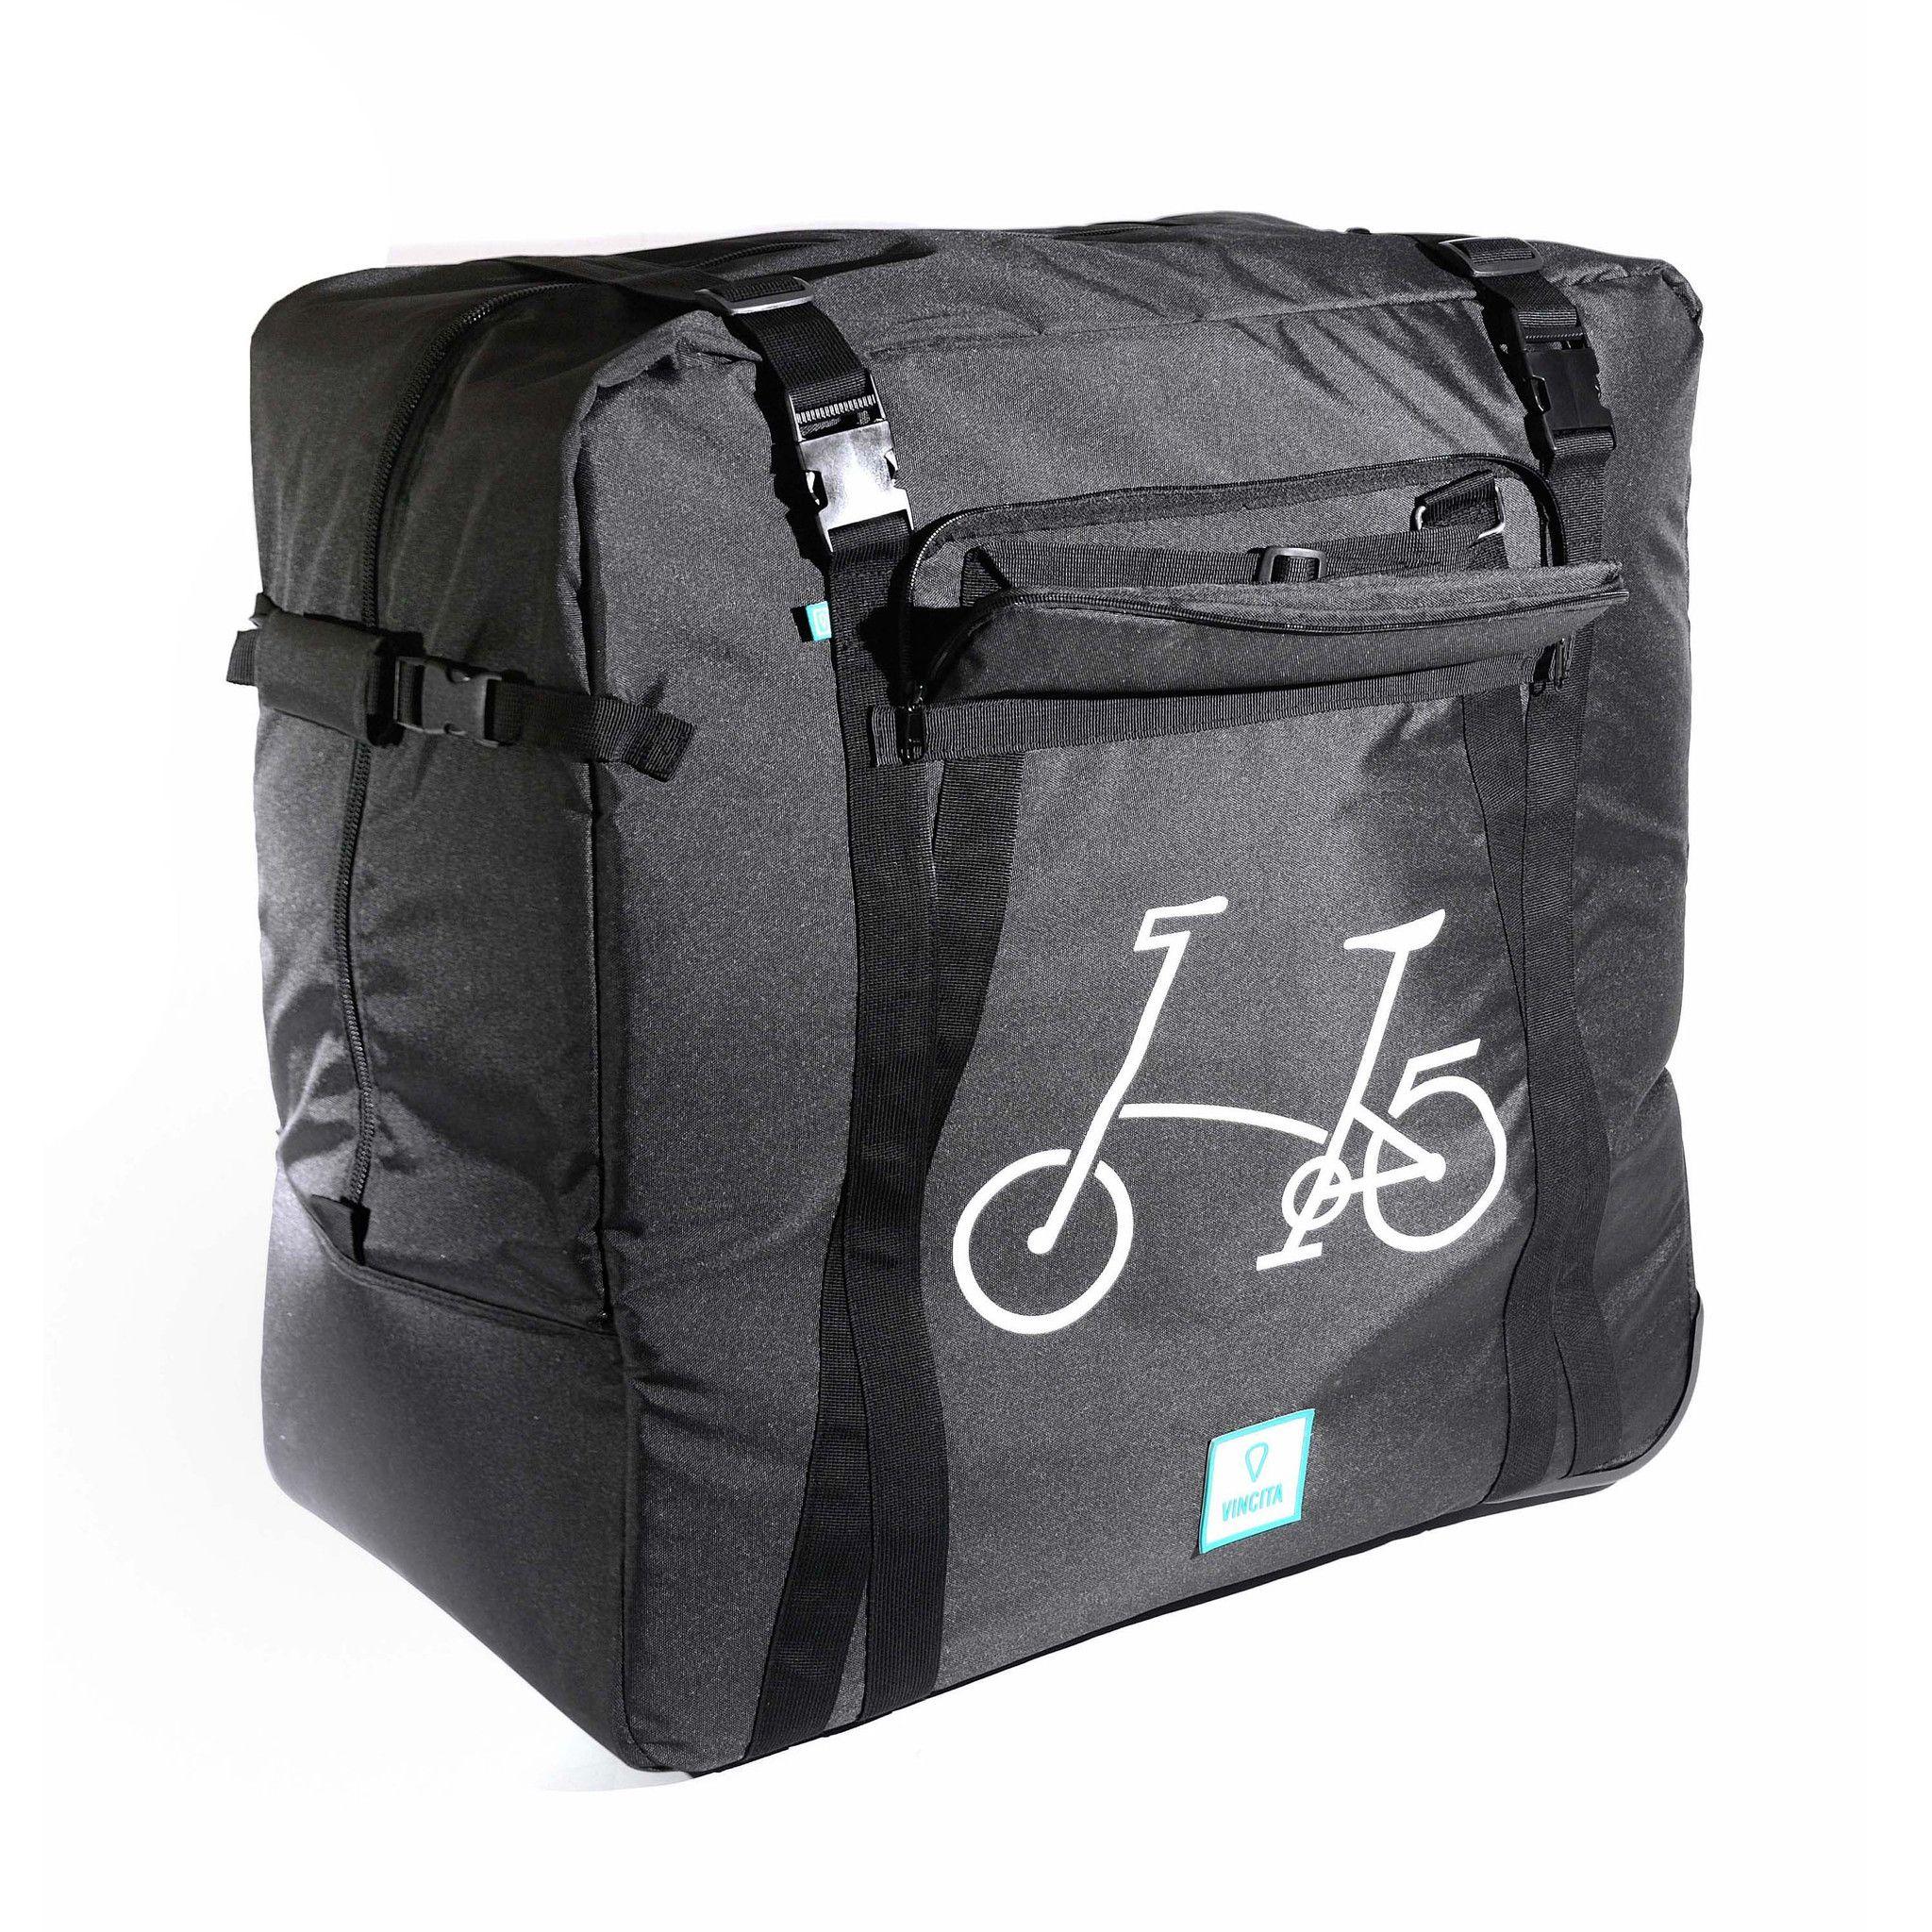 Set 2 Soft Transport Bag For Brompton B132b Bike Cover Bike